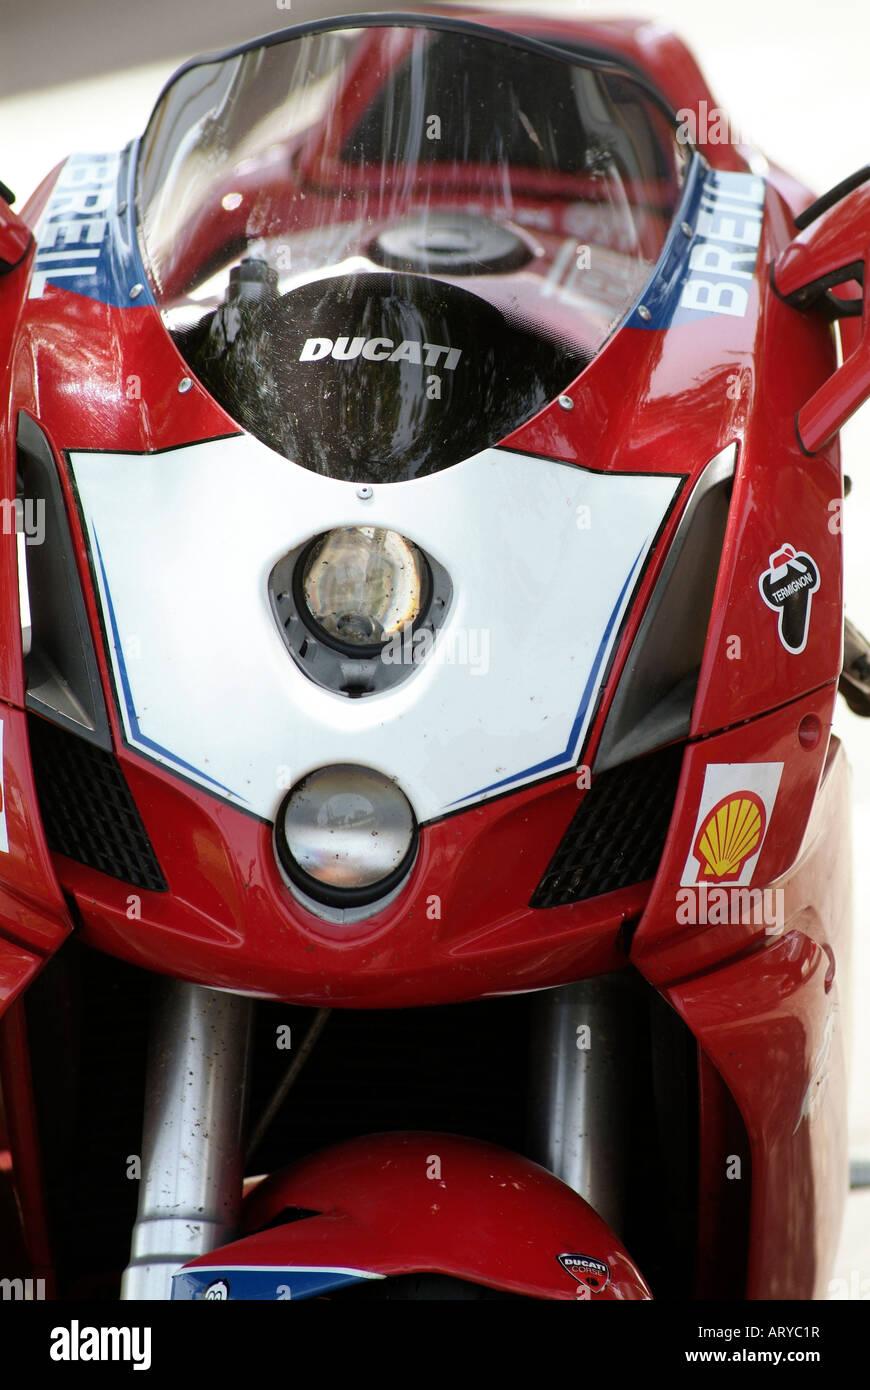 Ducati Sports Bike Motor Motorbike Motorcycle Stock Photo 16151314